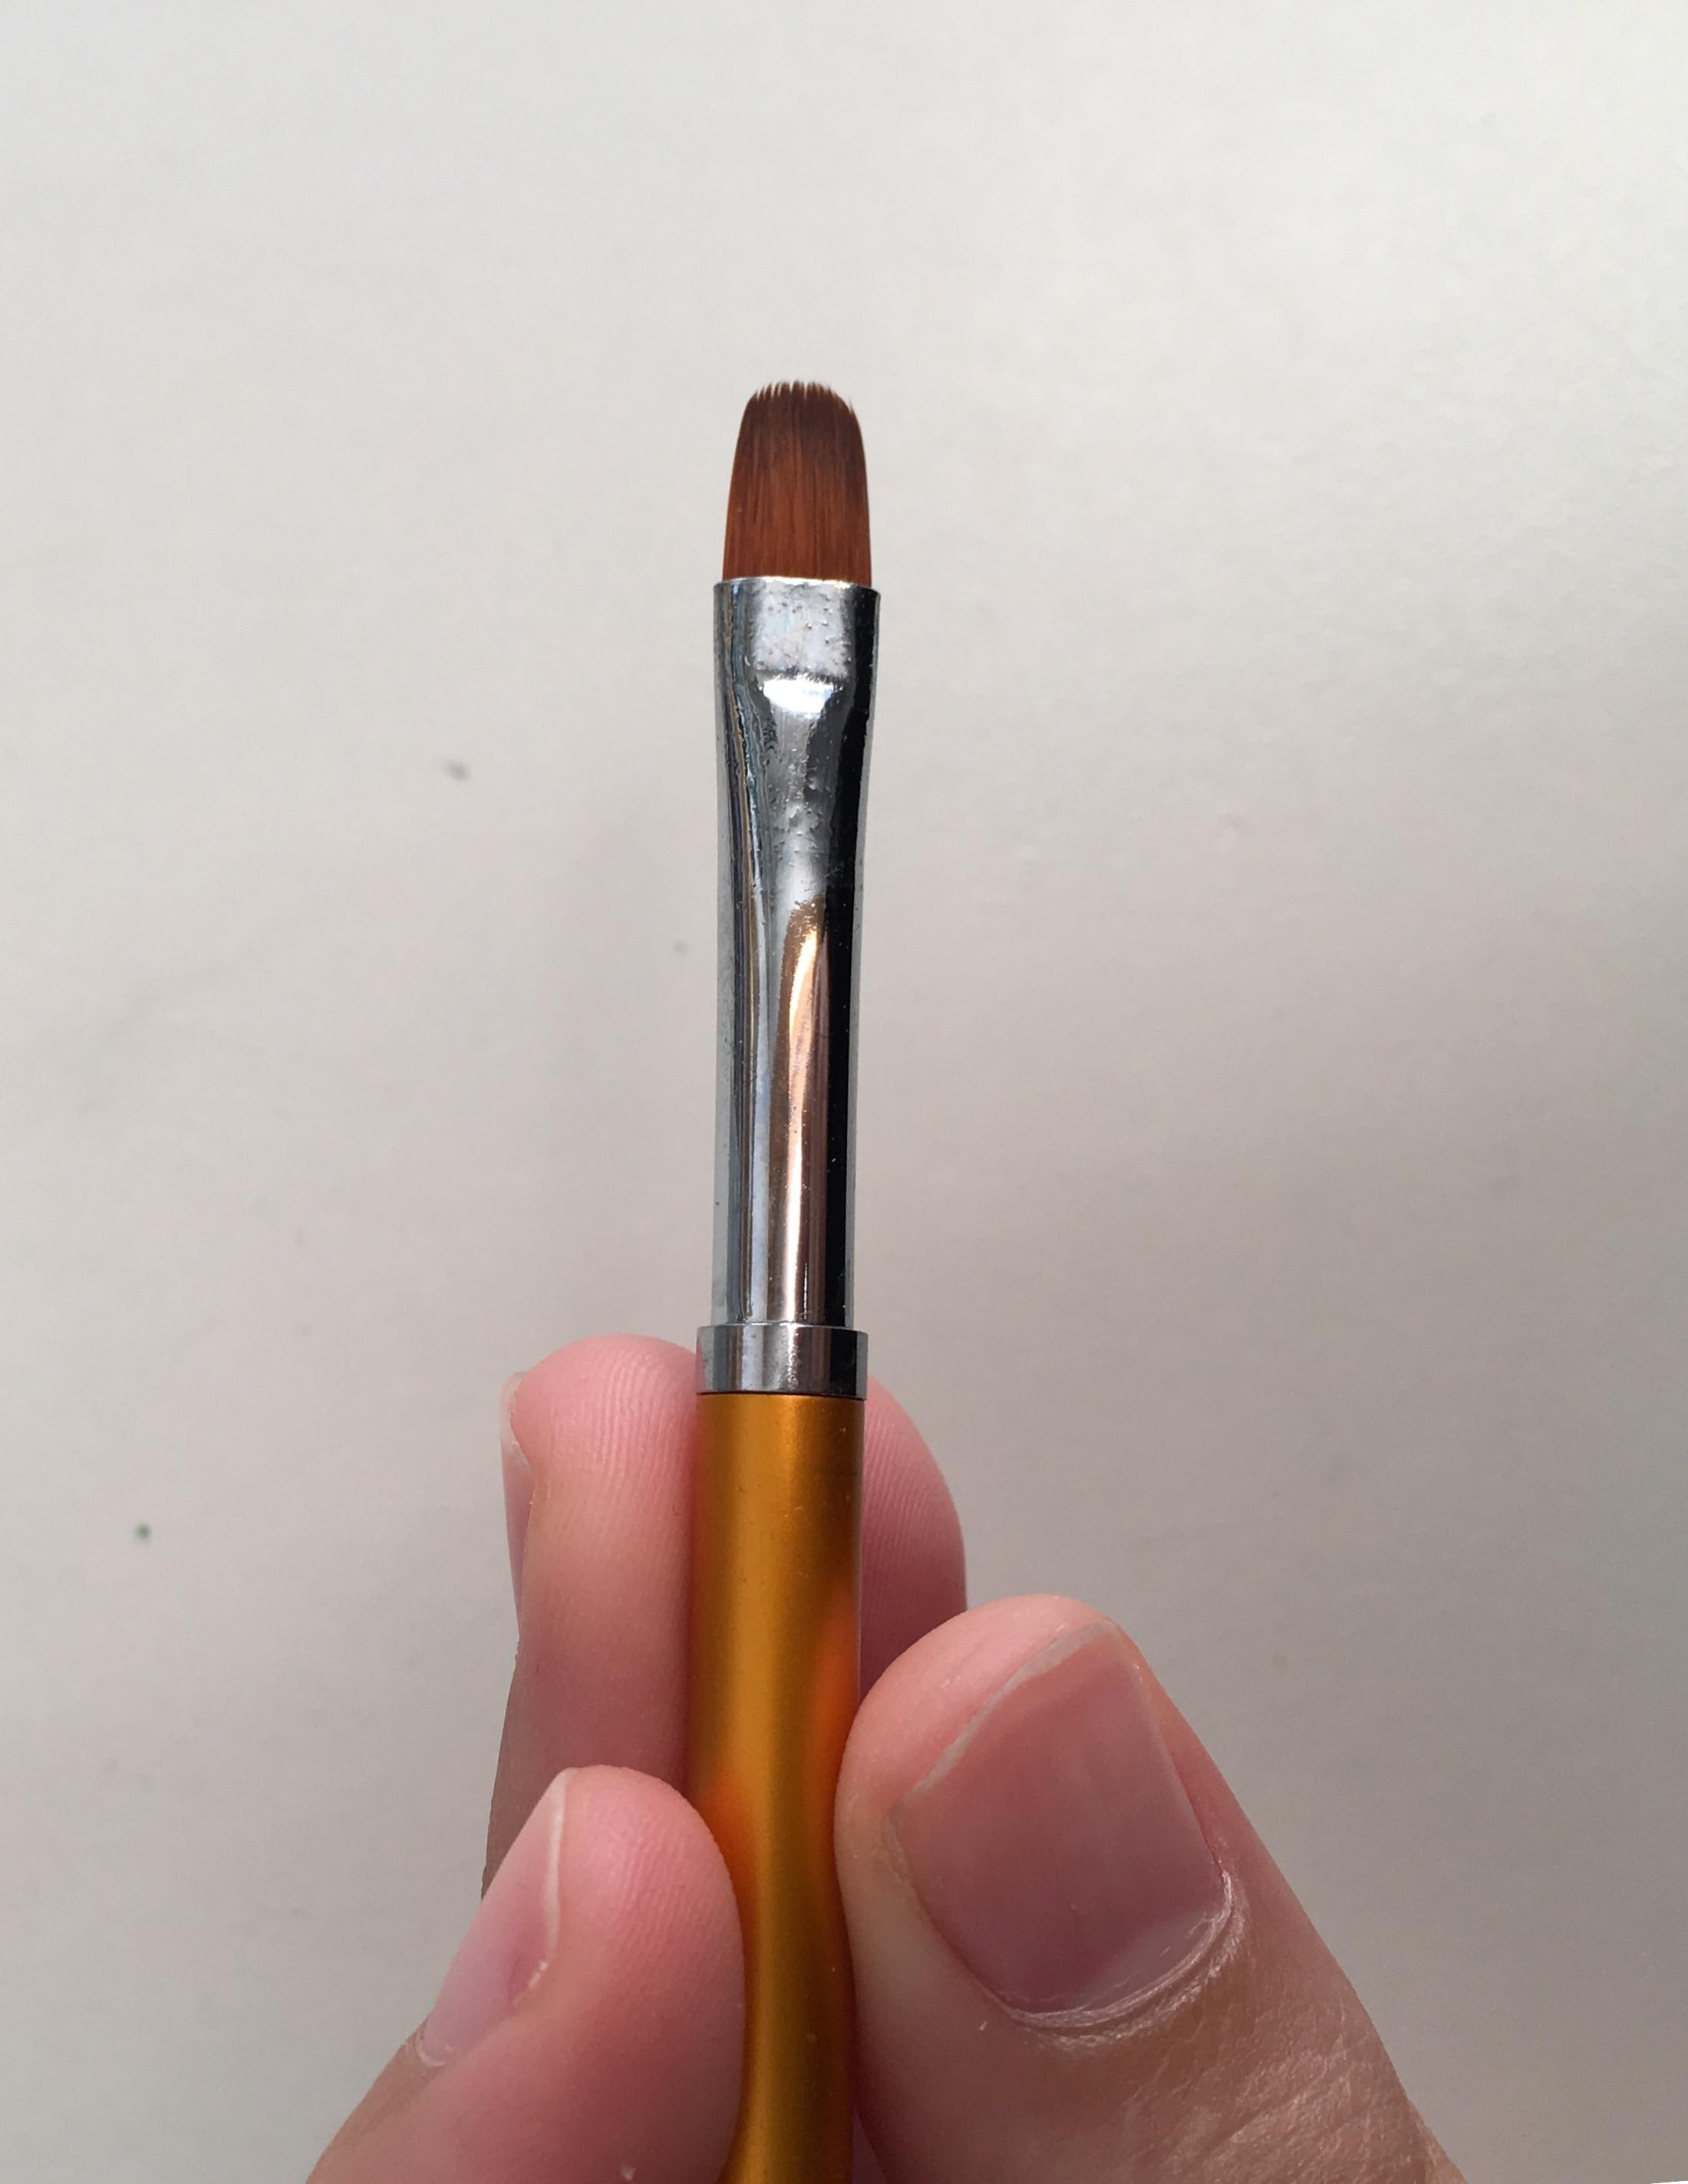 3 Size Nail Art Gold Round Top Painting Brush Set Gel Polish Tips Extending Coating 3D Petal Flower DIY Drawing Shaping Pens Kit reviews №5 161375